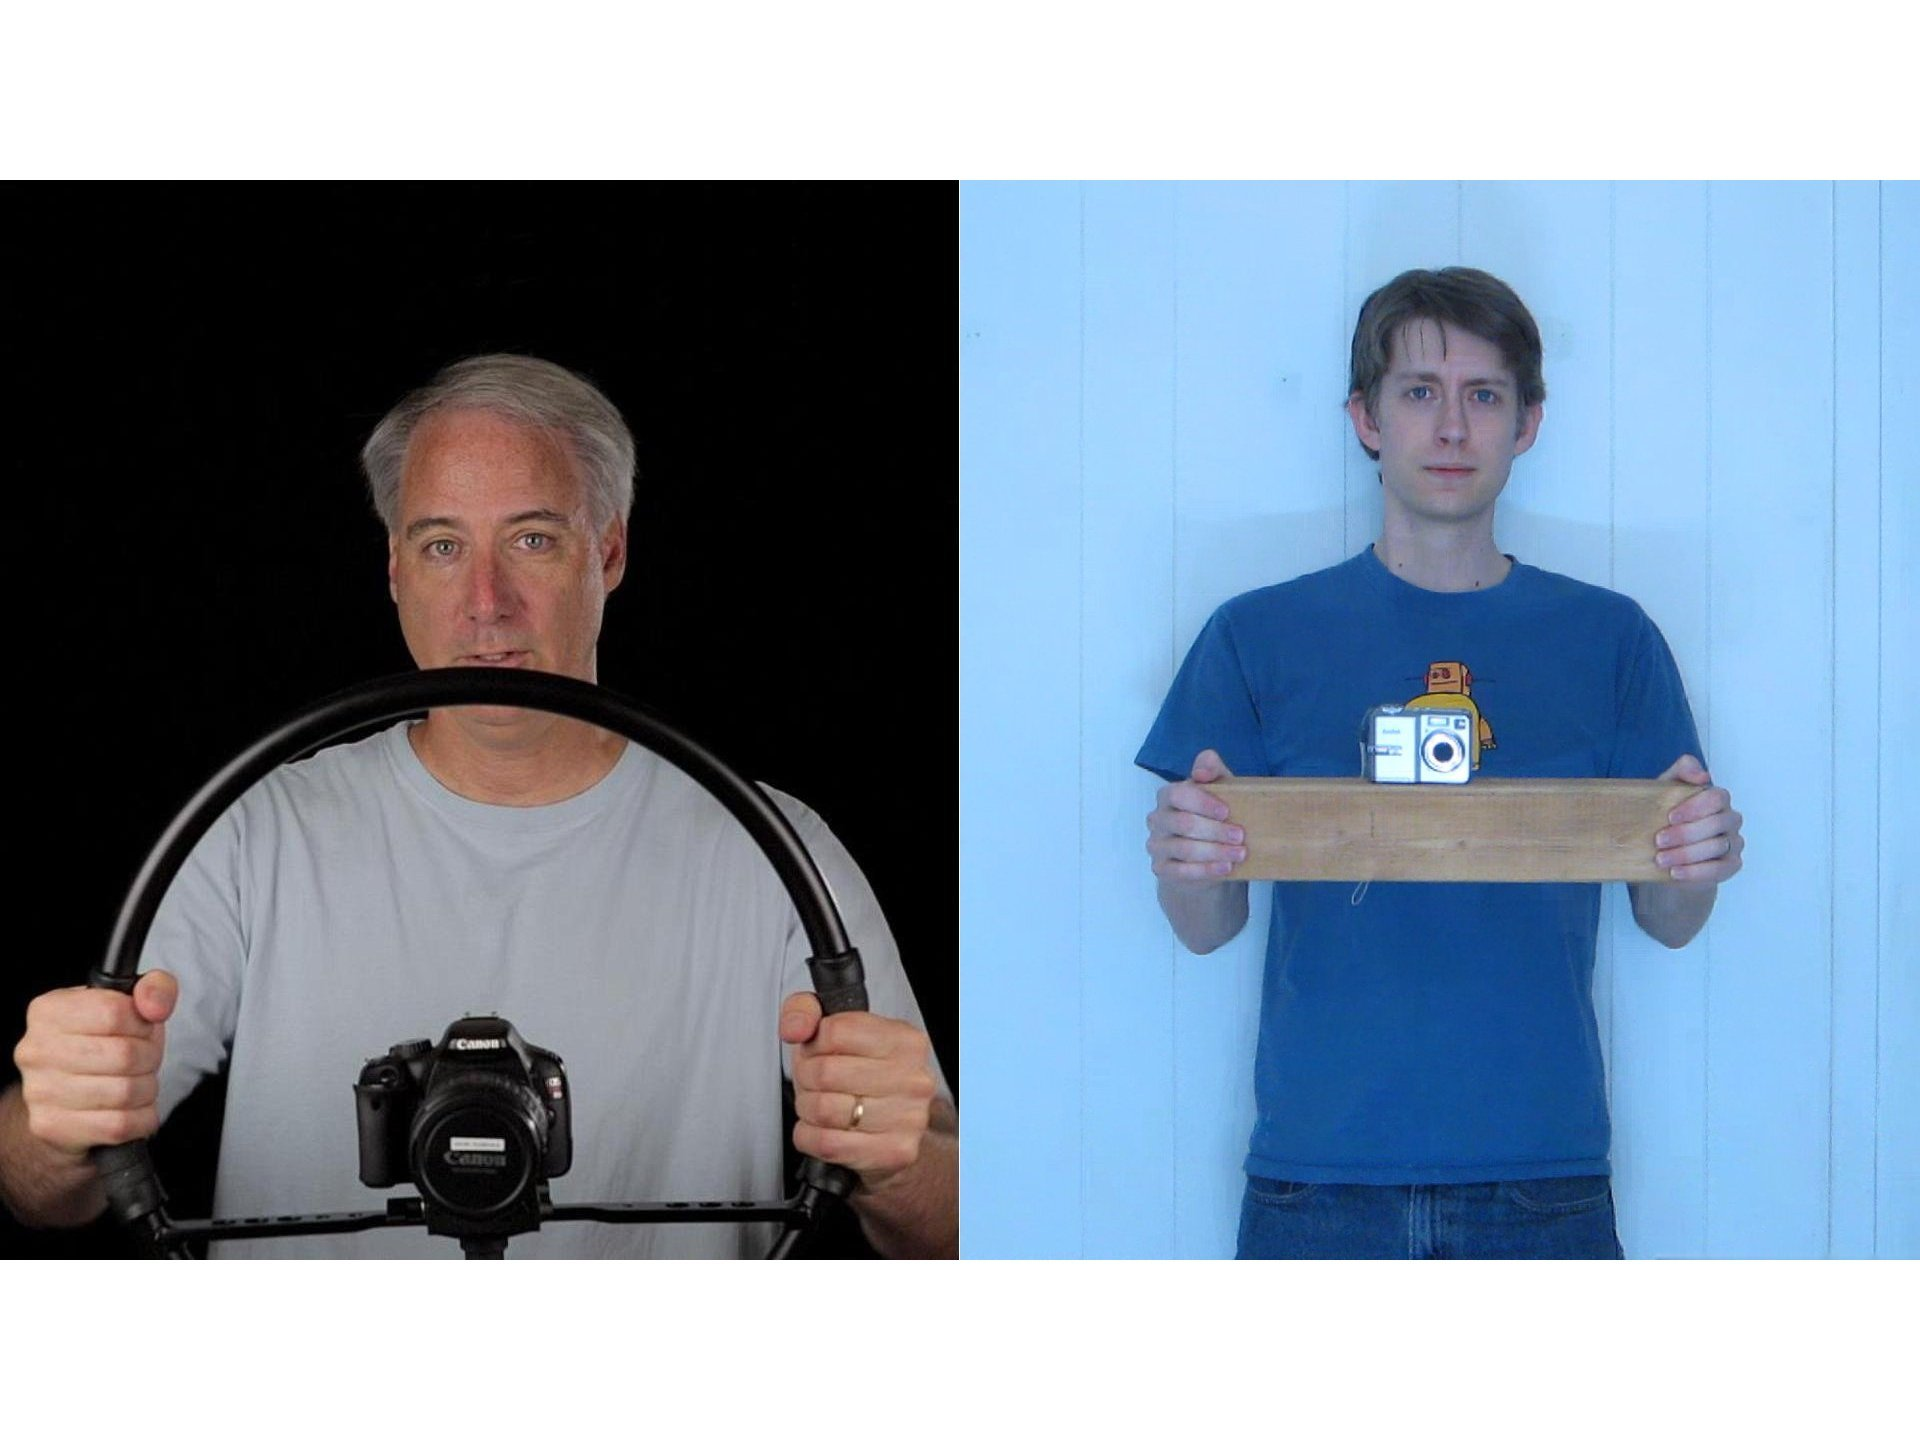 New Project: 2×4 CameraStabilizer